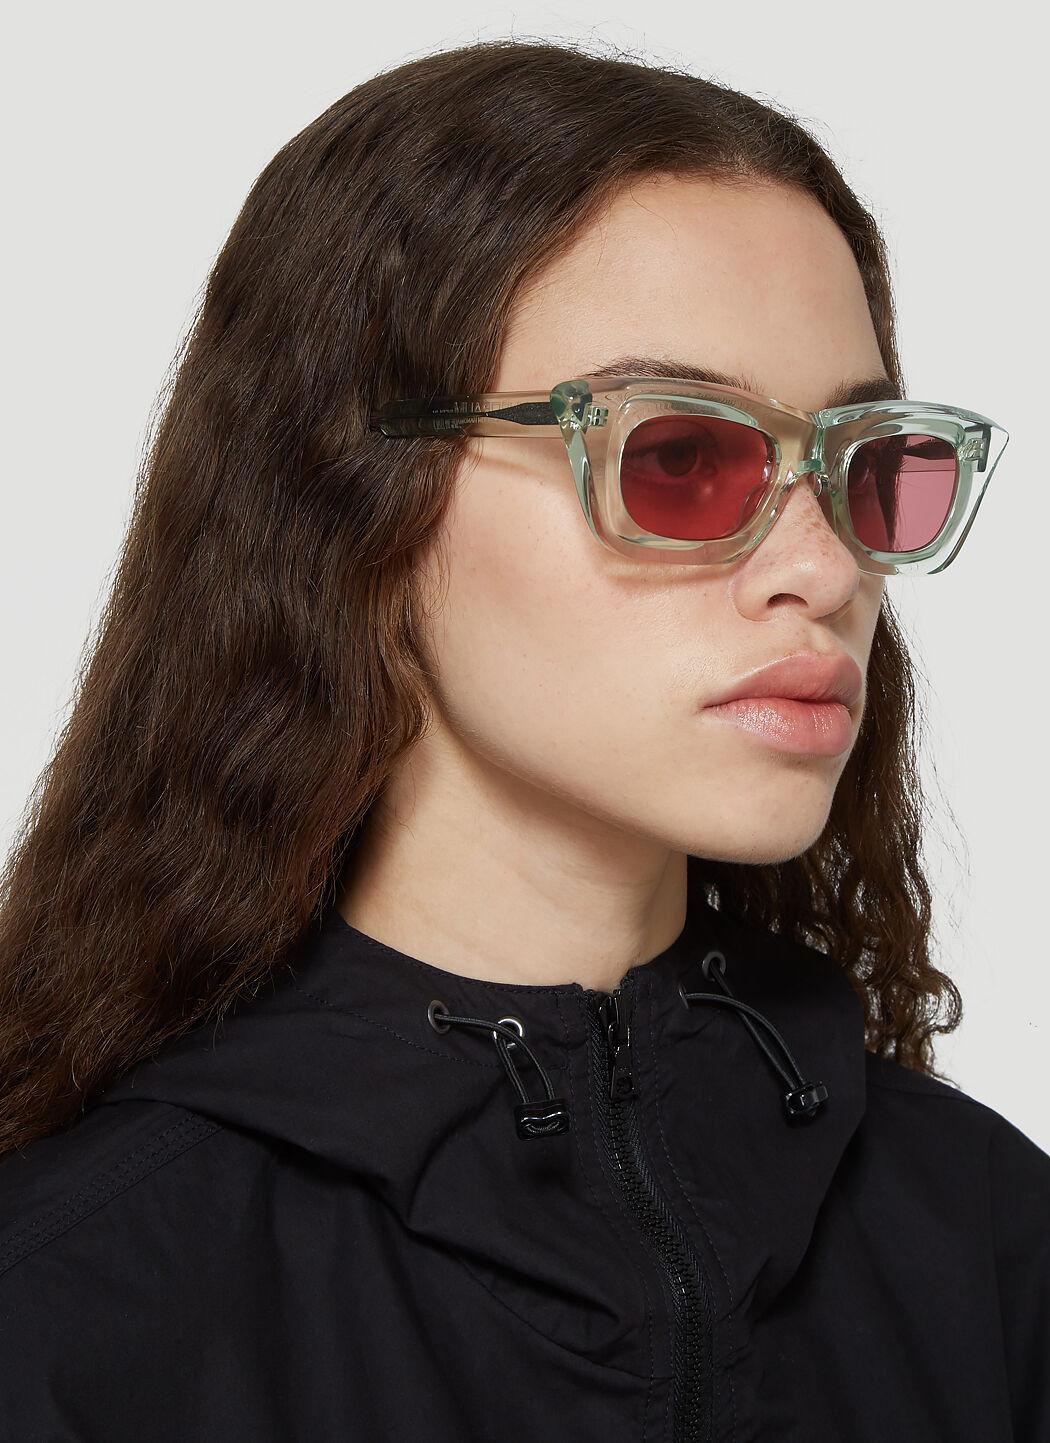 REWOP MILANO Tinted Coloured Lenses Sunglasses Tinted Sunglasses Trend Le Specs Karen Walker KUBORAUM BERLIN buy shop online rainbow trend 2020 sunglasses fashion runway shopping